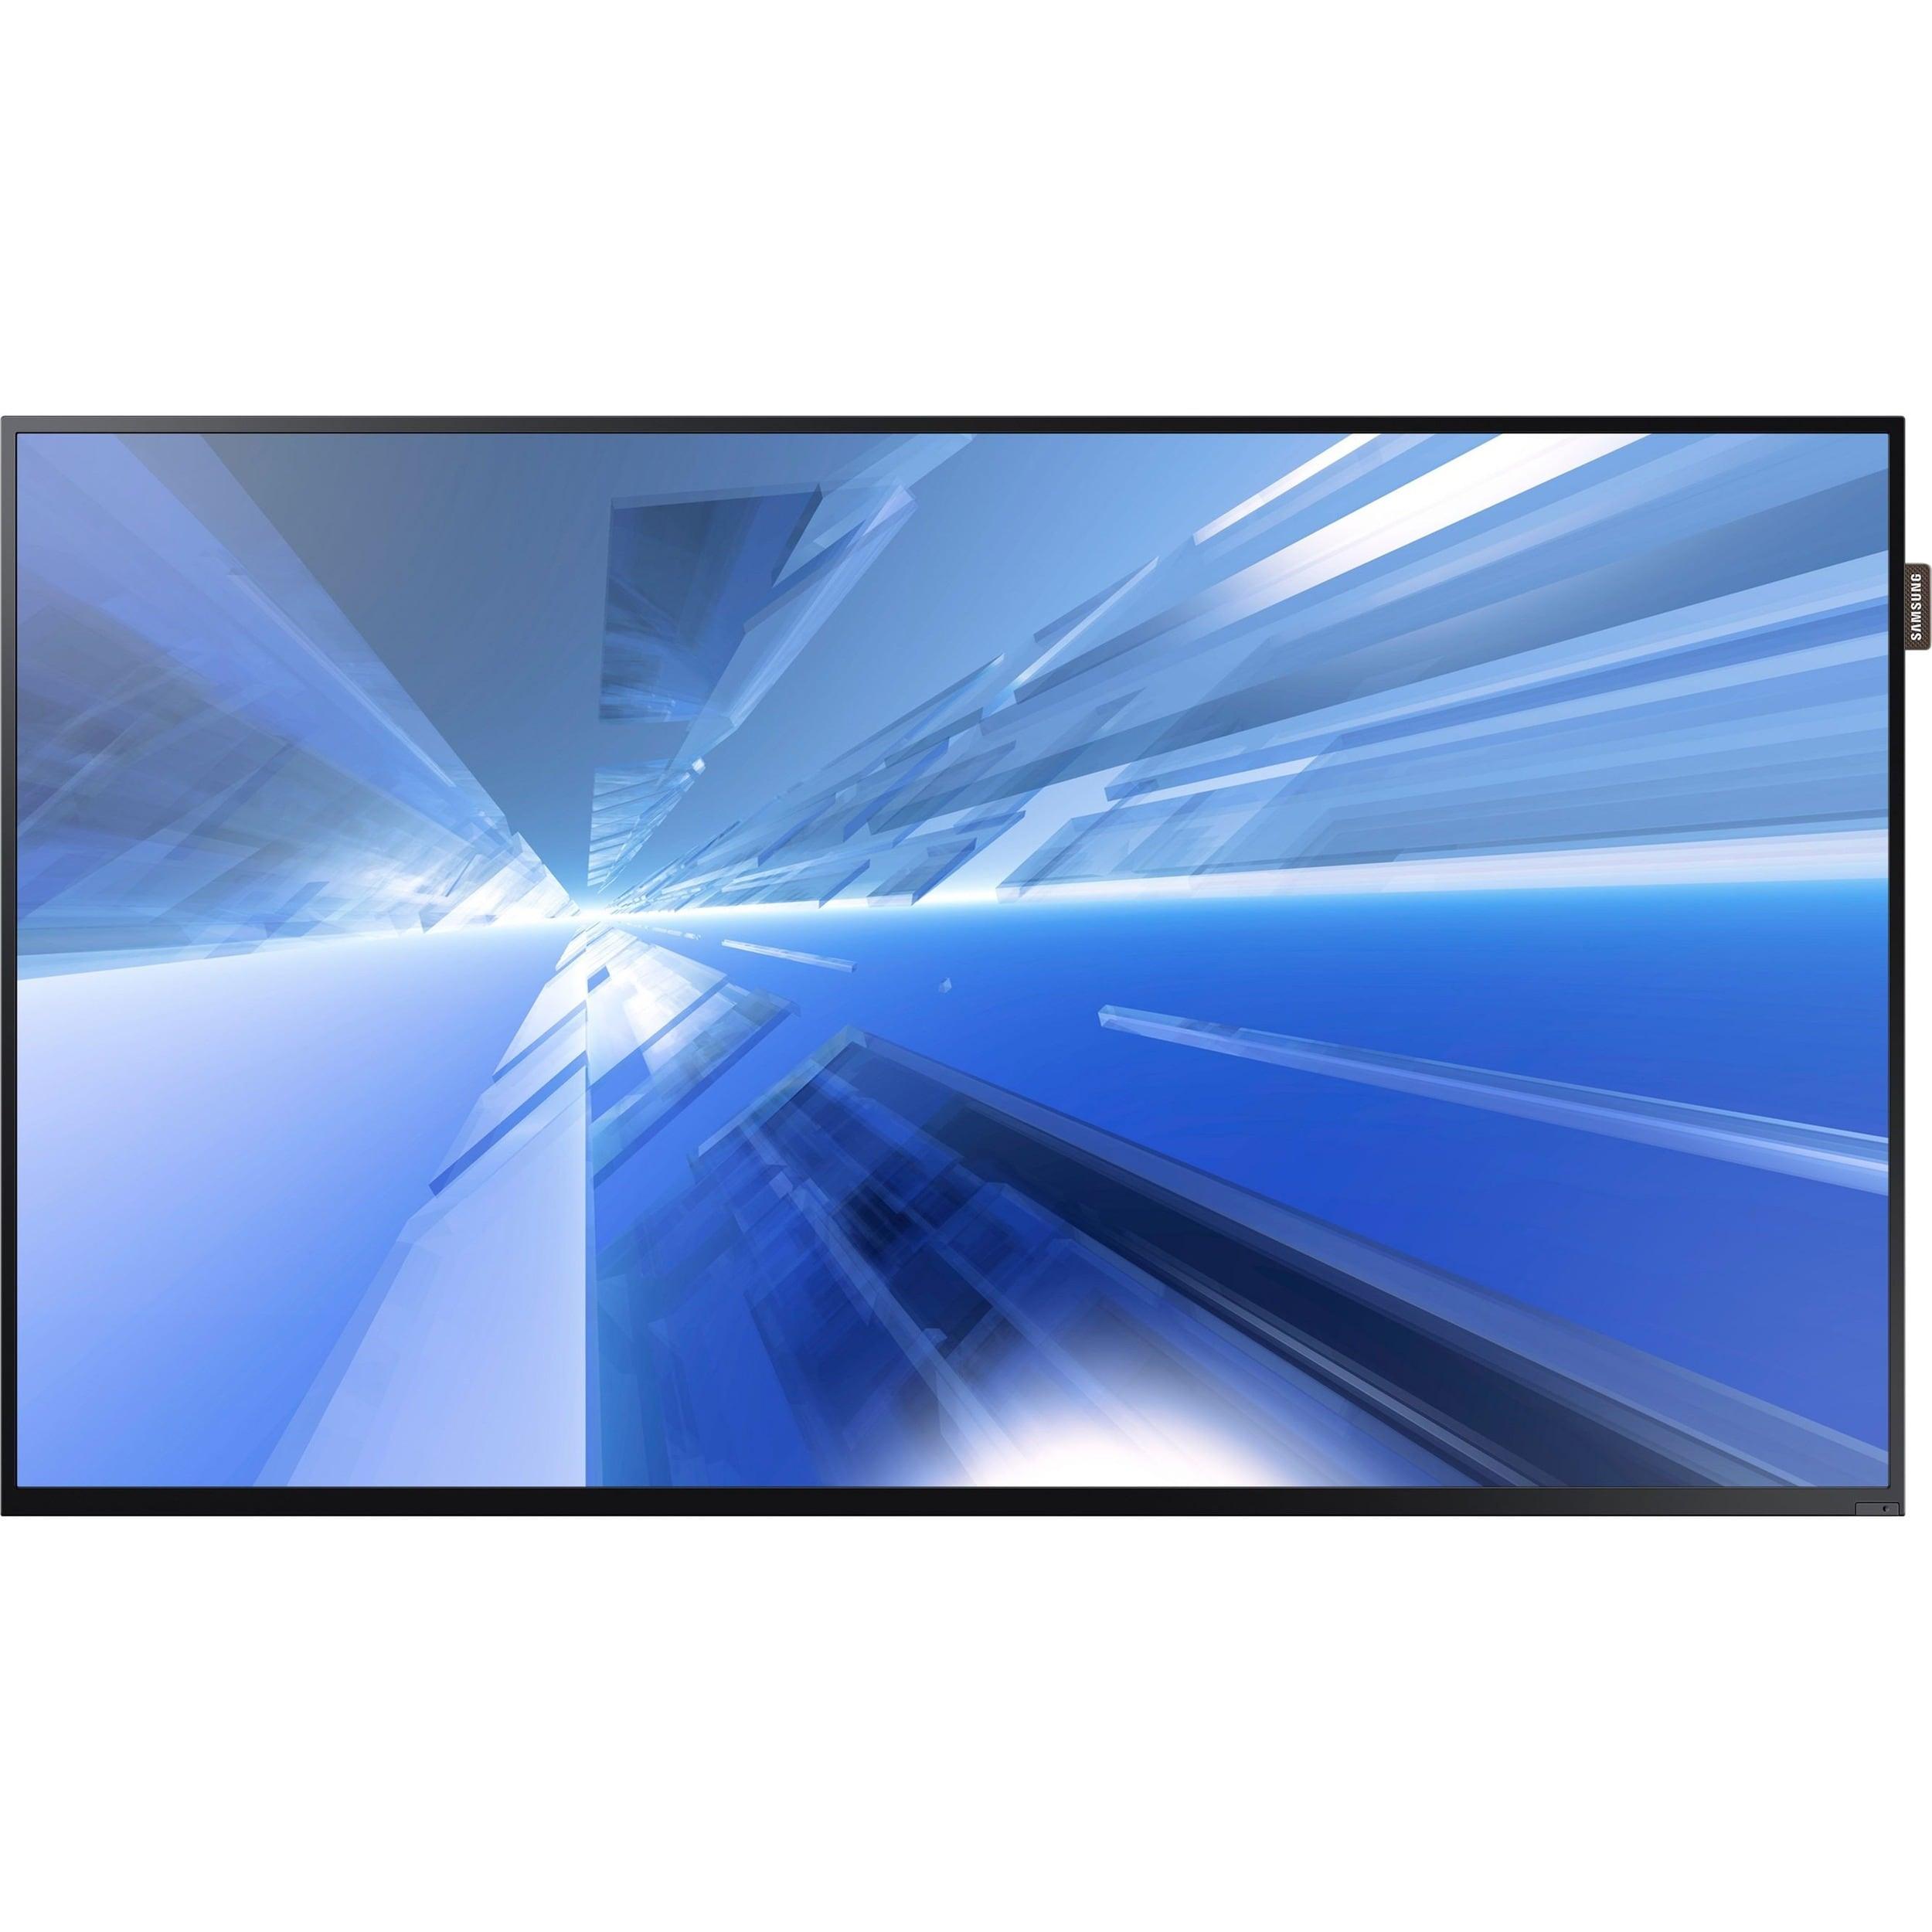 "Samsung DB55E - DB-E Series 55"" Slim Direct-Lit LED Displ..."